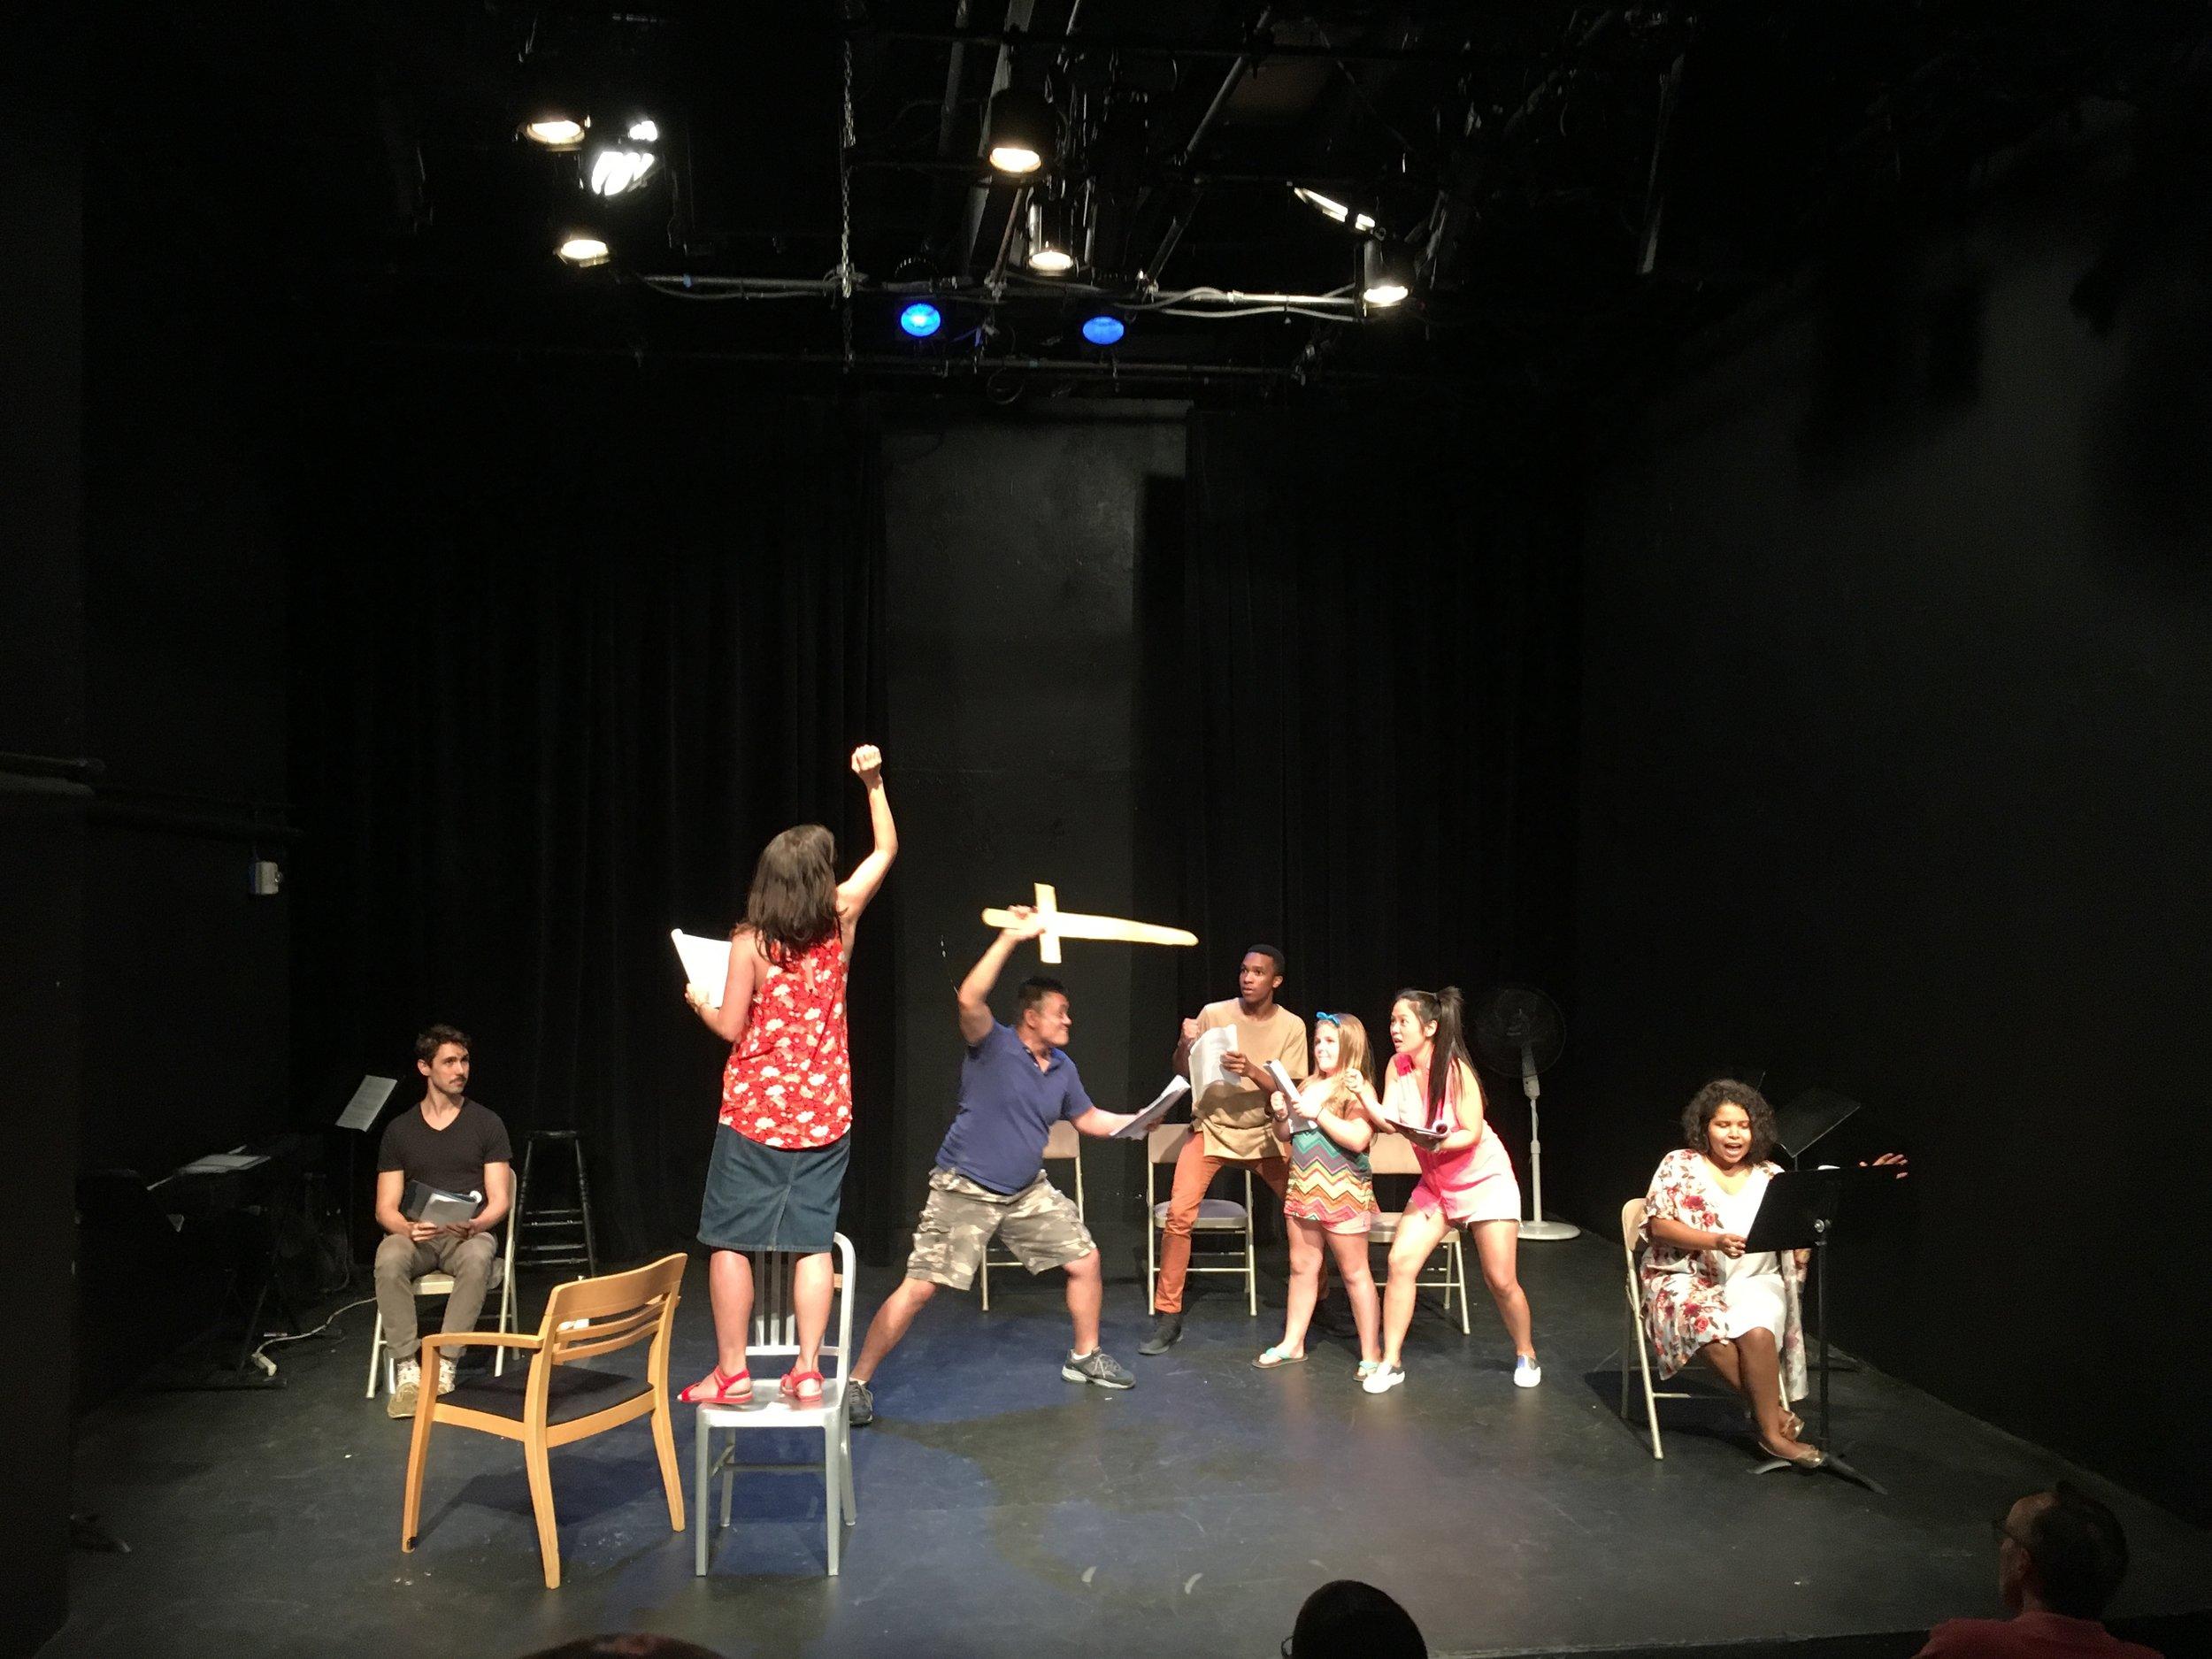 Urban Stages Family Night Reading Cast: Ariel Estrada, Drew Bolander, Jessica Vera, Hui-Shan Yong, Quinn Gavin, Alex Robertson, Sara Gomez